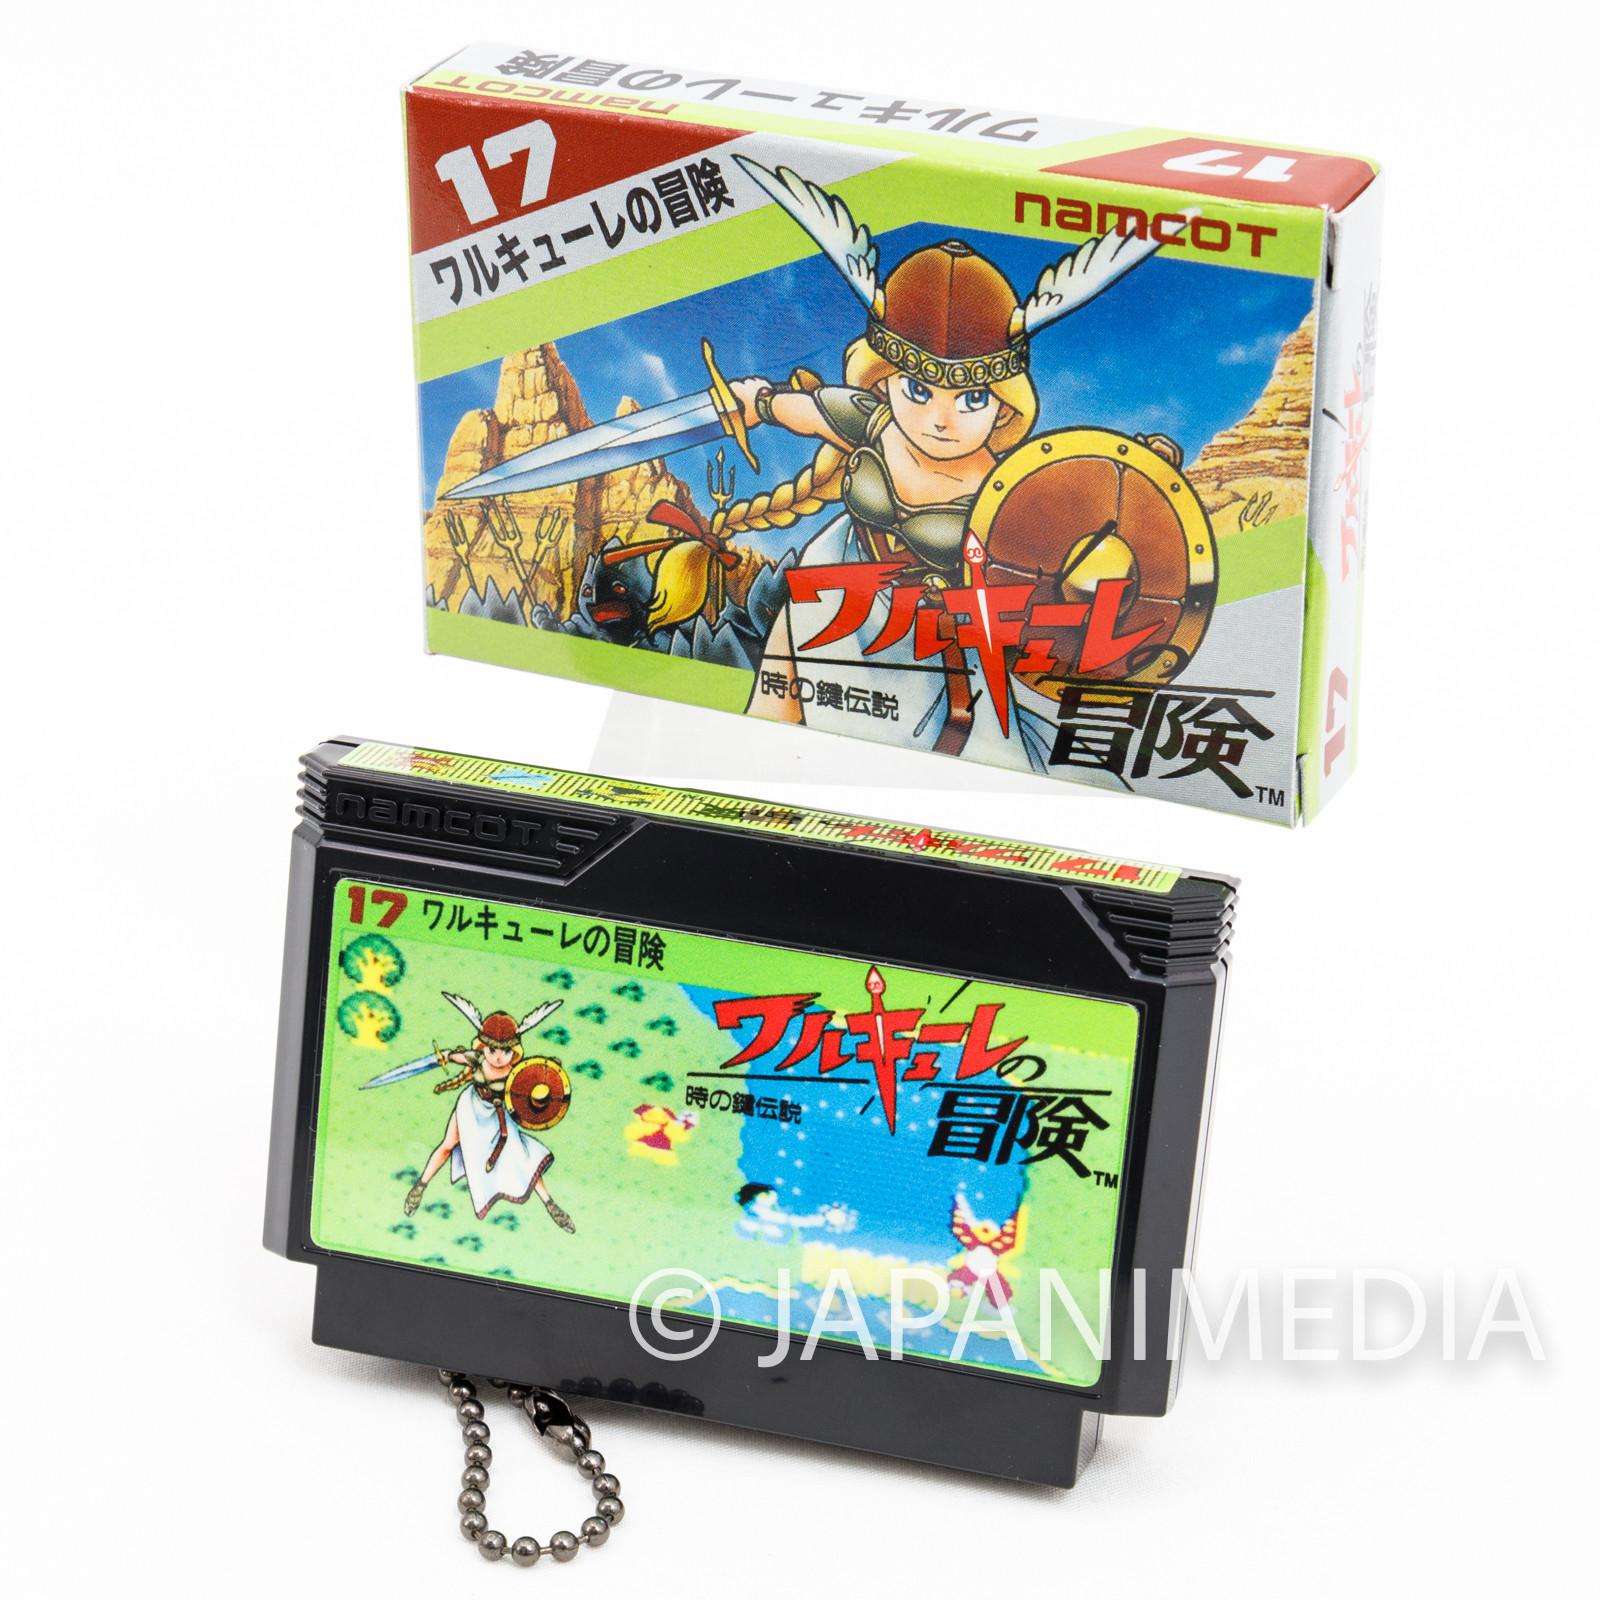 Valkyrie no Boken Namco Cassette Type Mascot Ballchain JAPAN FAMICOM NEC